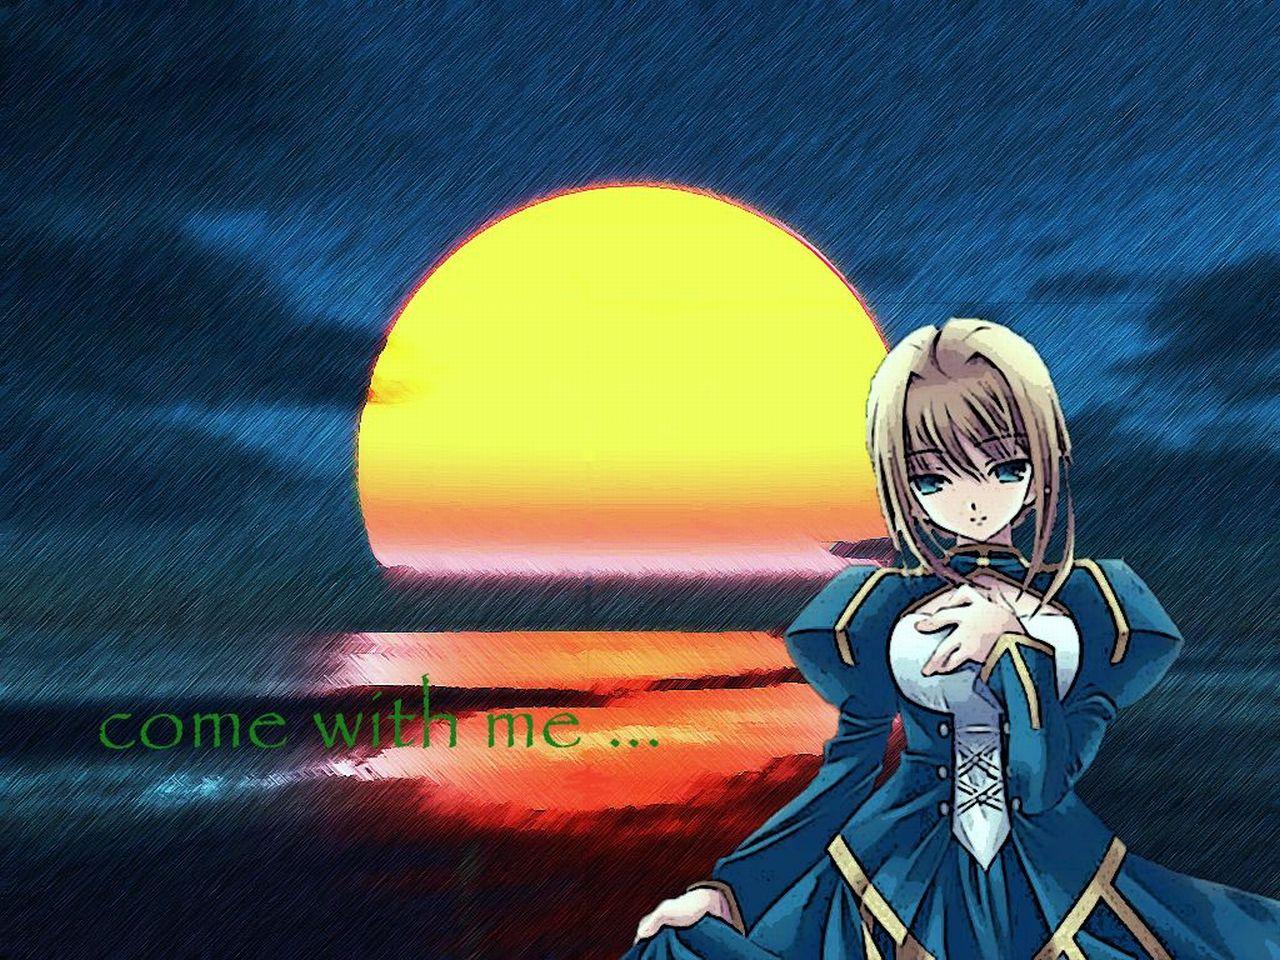 Minitokyo_Sunset_Wallpapers_454114.jpg